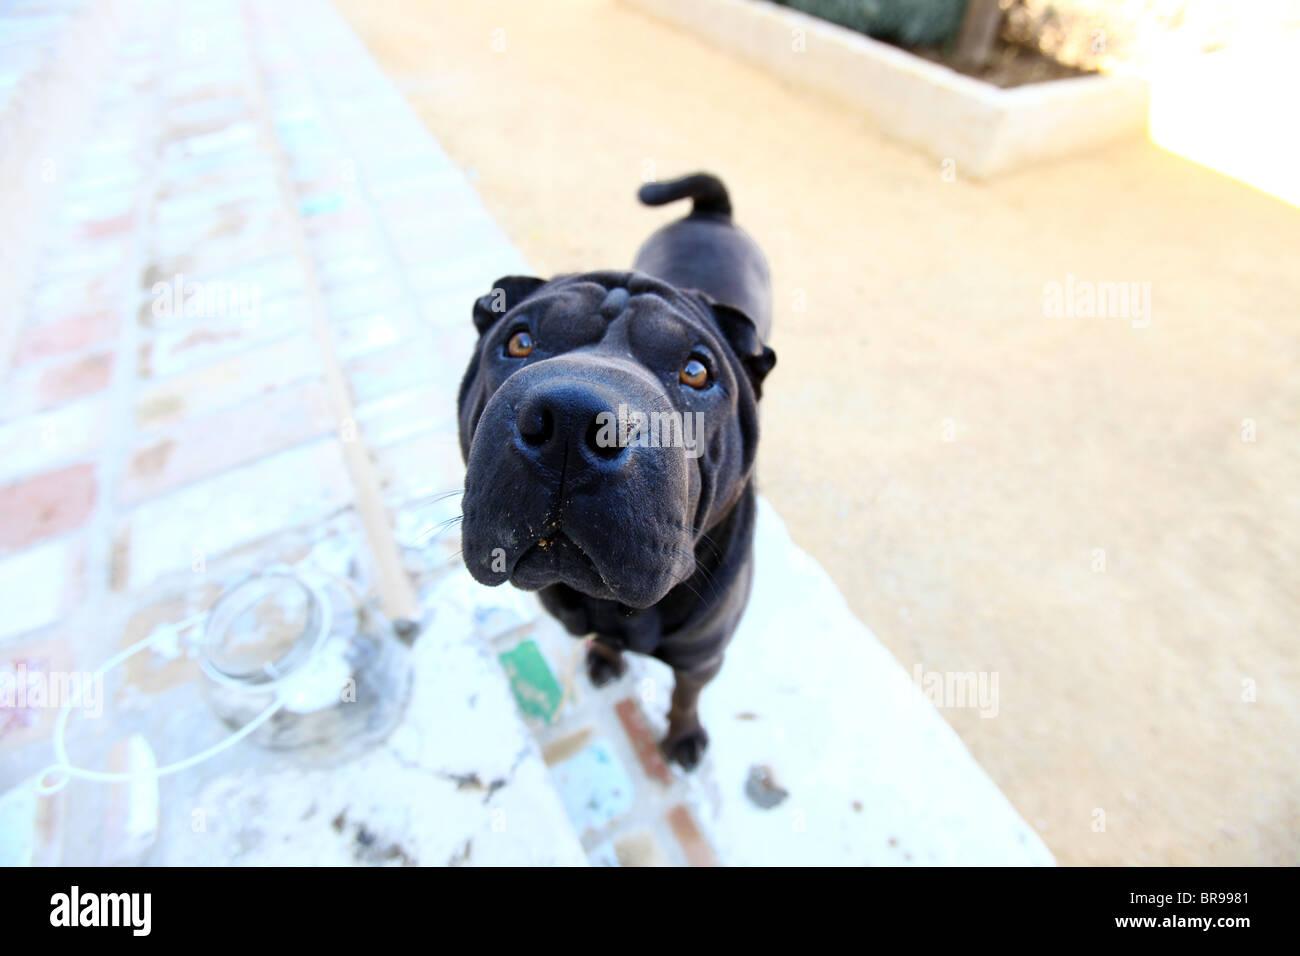 Shar Pei dog looking upward - Stock Image